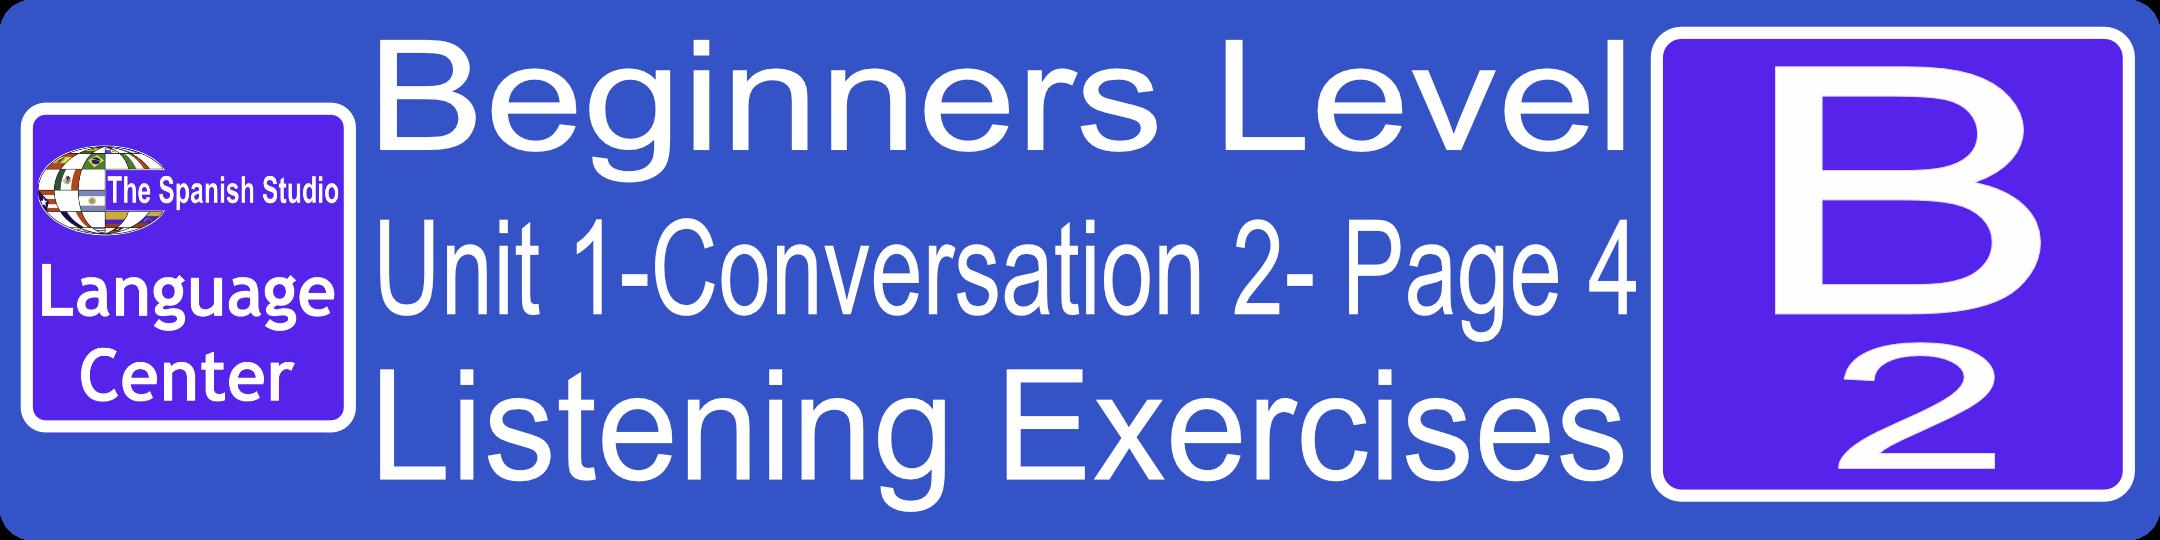 Spanish Listening Exercises Button B2